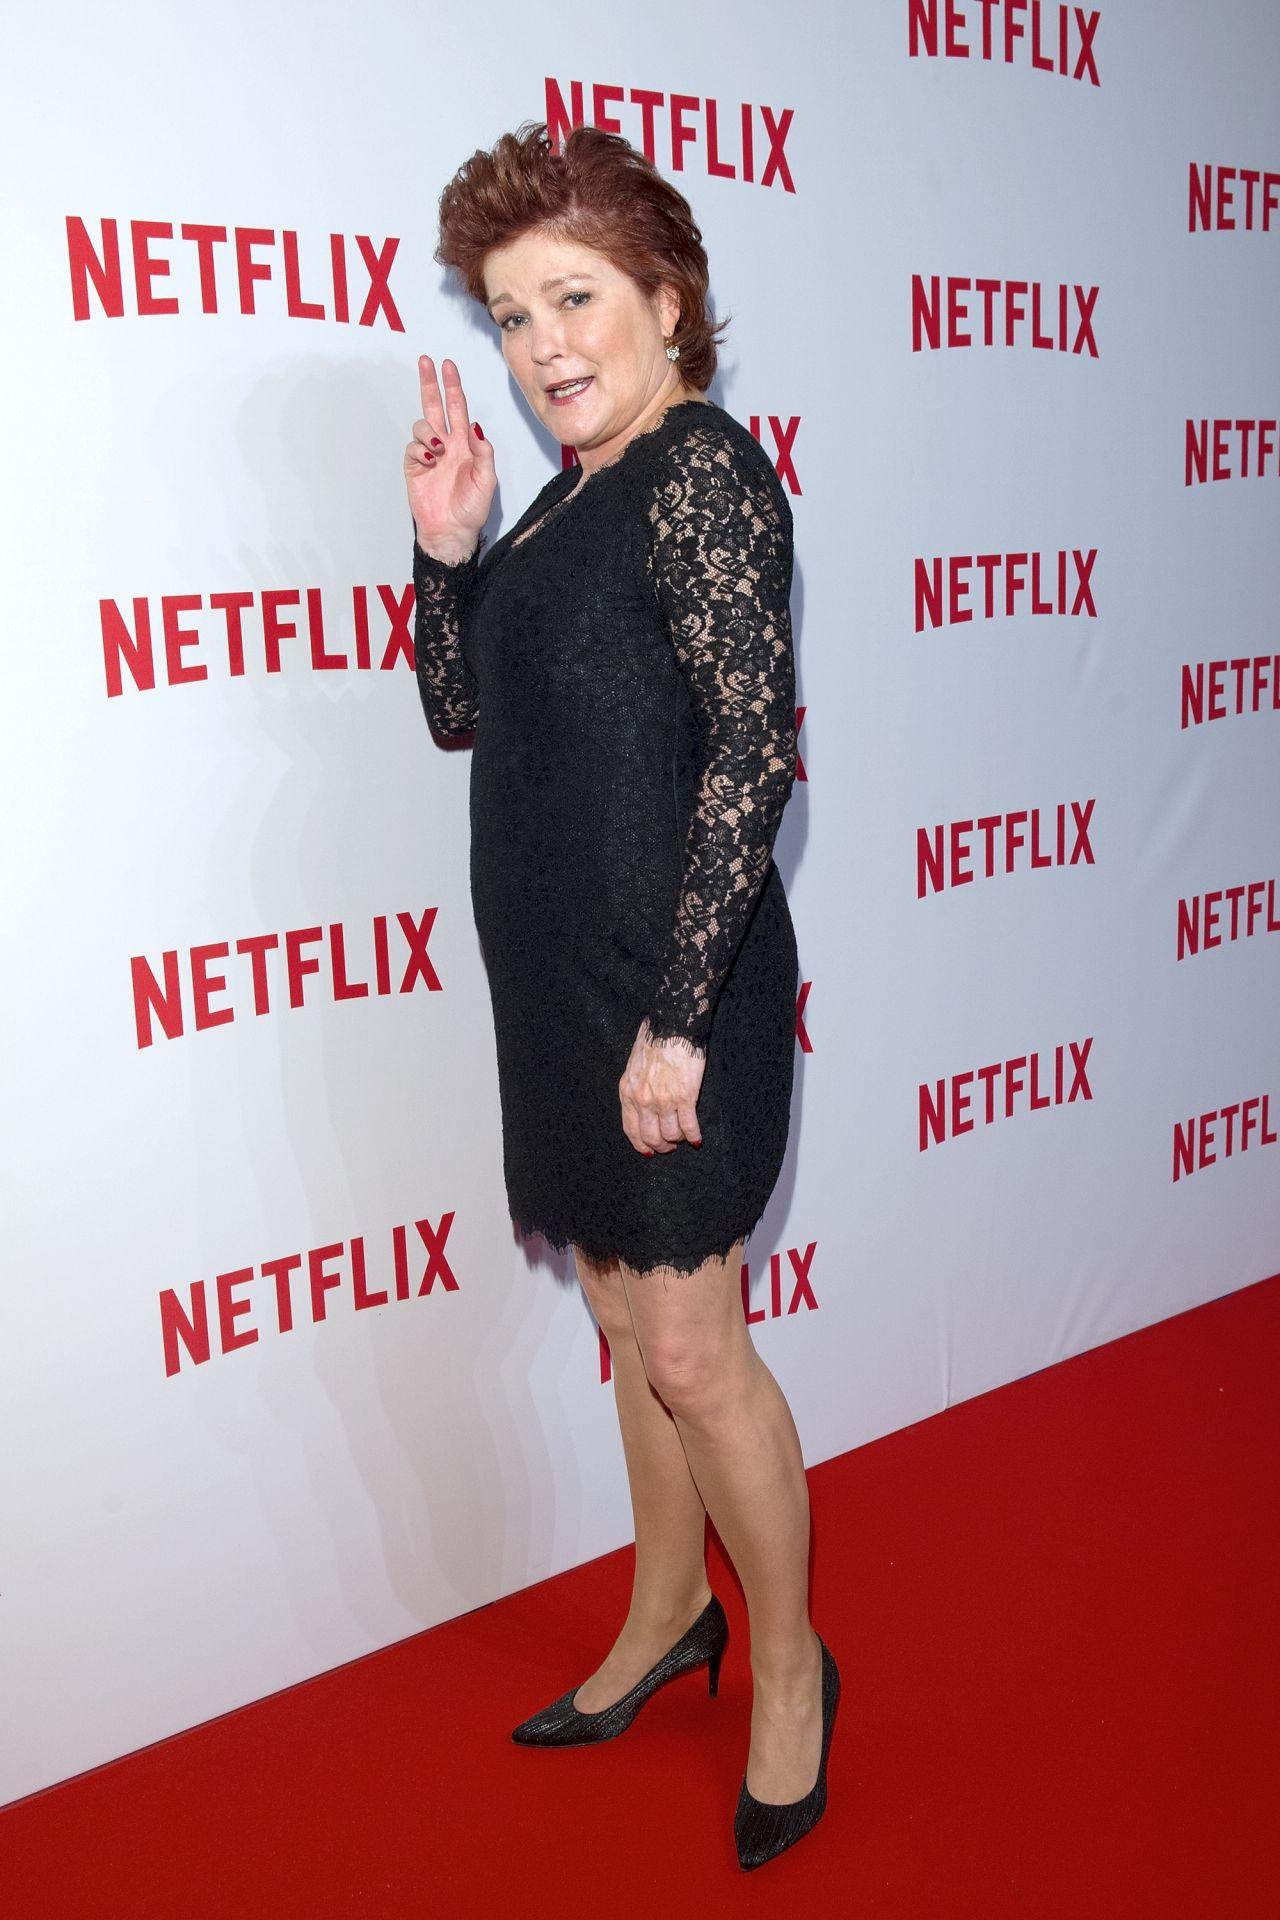 Kate Mulgrew - Netflix Hosts Pre Launch Party In Berlin - September 2014